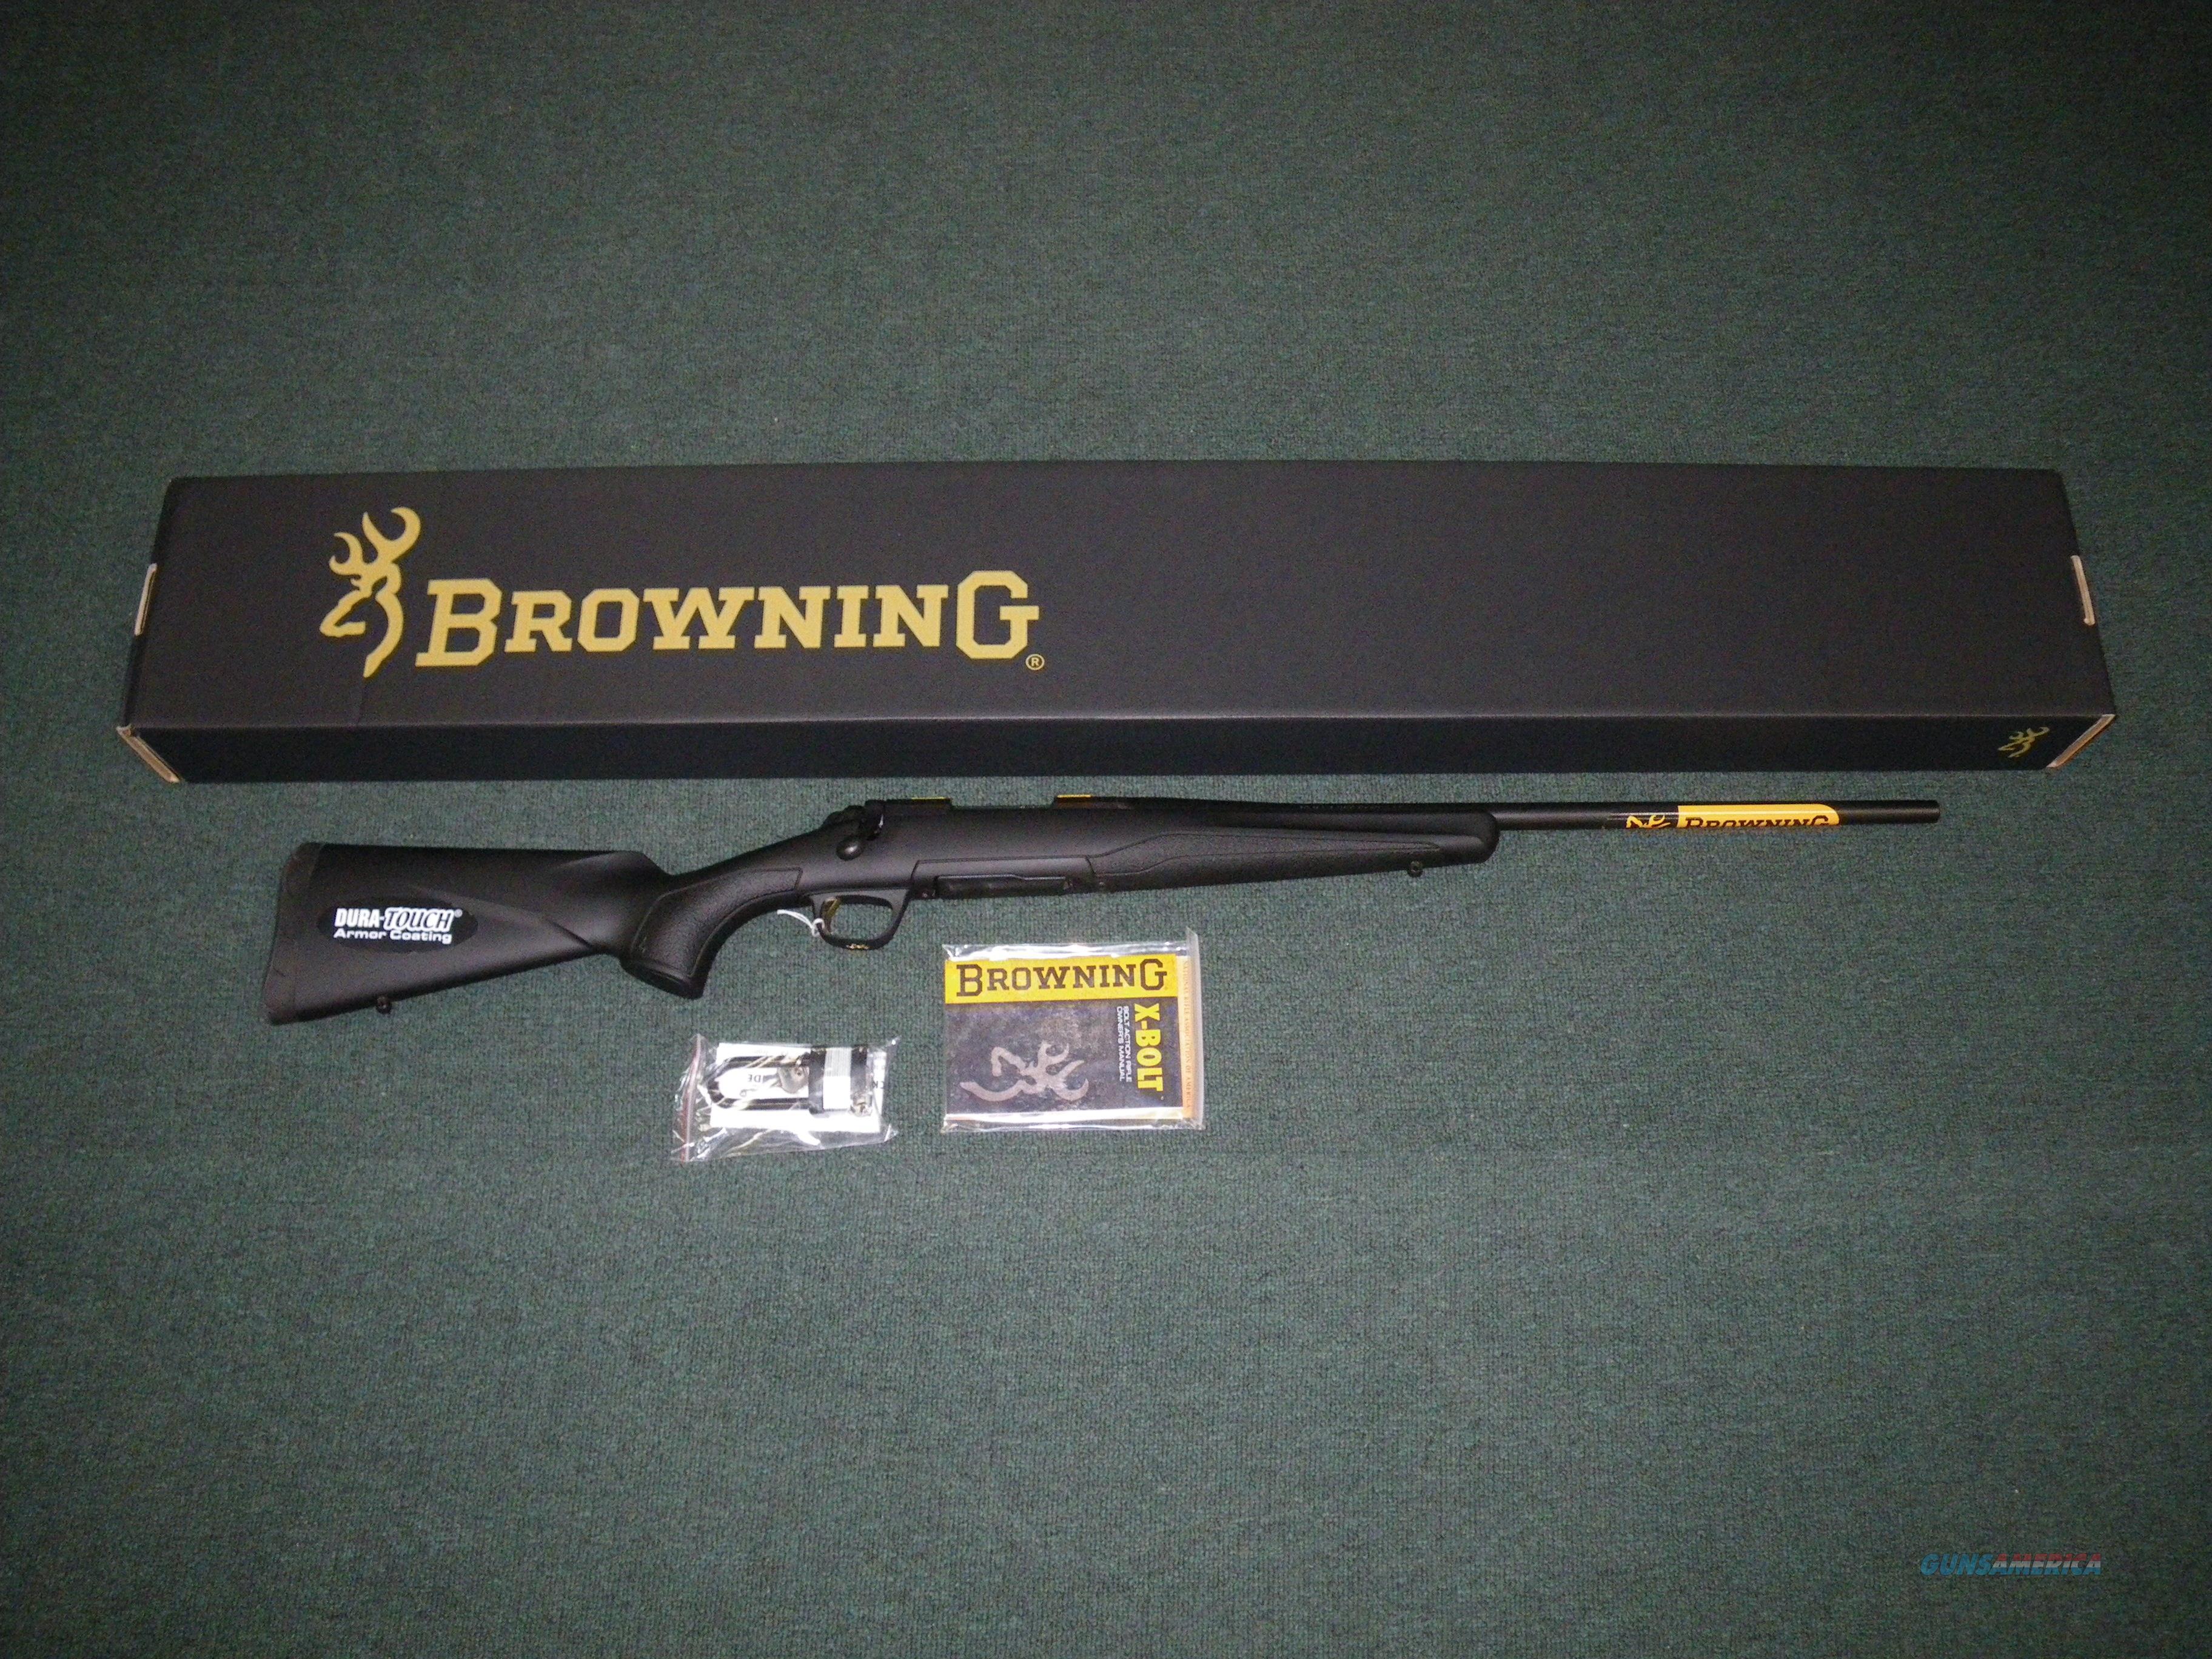 Browning X-Bolt Composite Stalker 223 Rem 22in NIB #035205208  Guns > Rifles > Browning Rifles > Bolt Action > Hunting > Blue